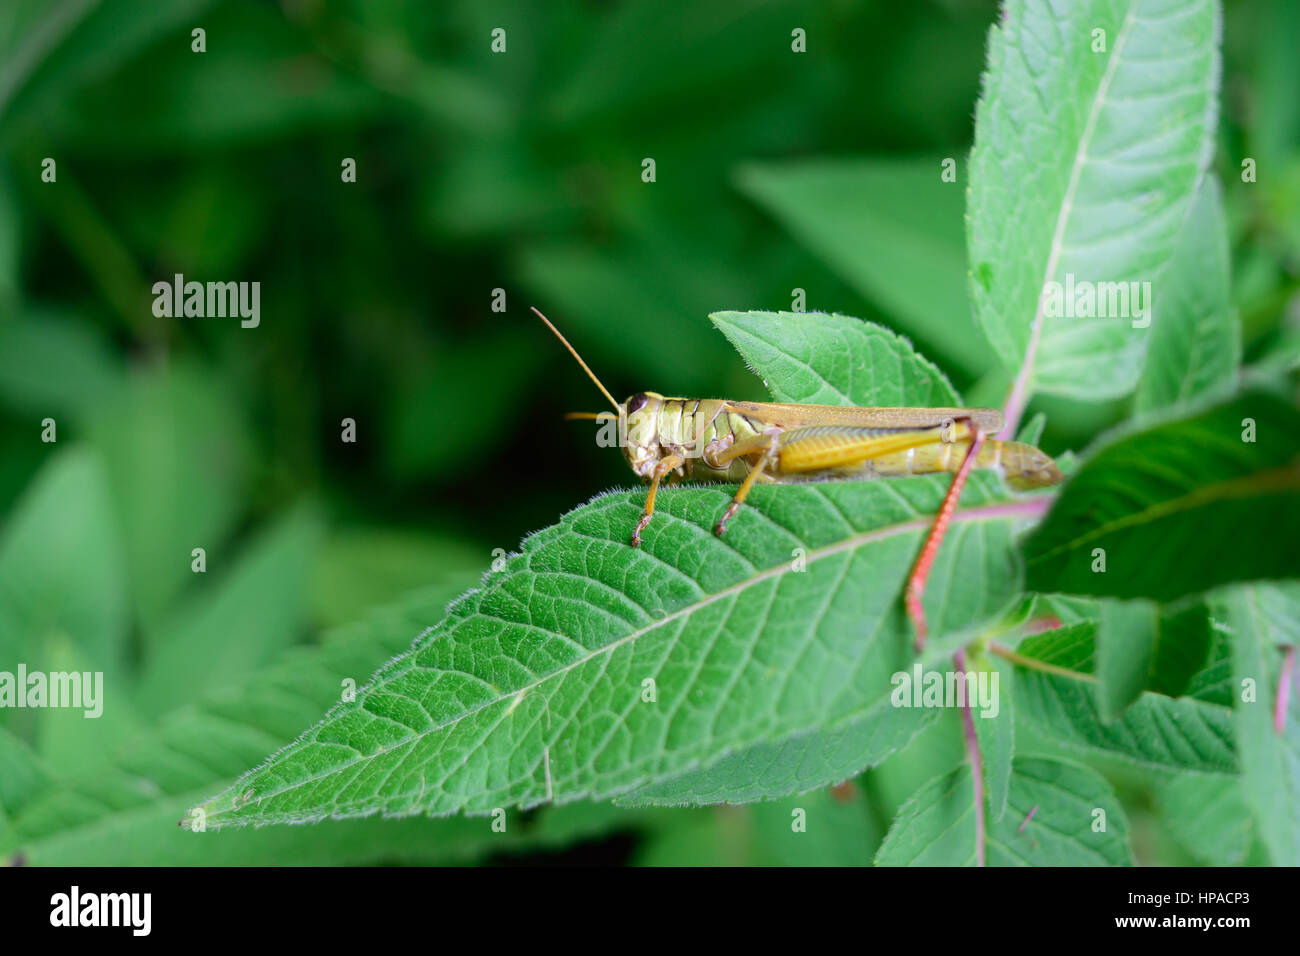 Closeup of Grasshopper on Flower Leaf - Stock Image